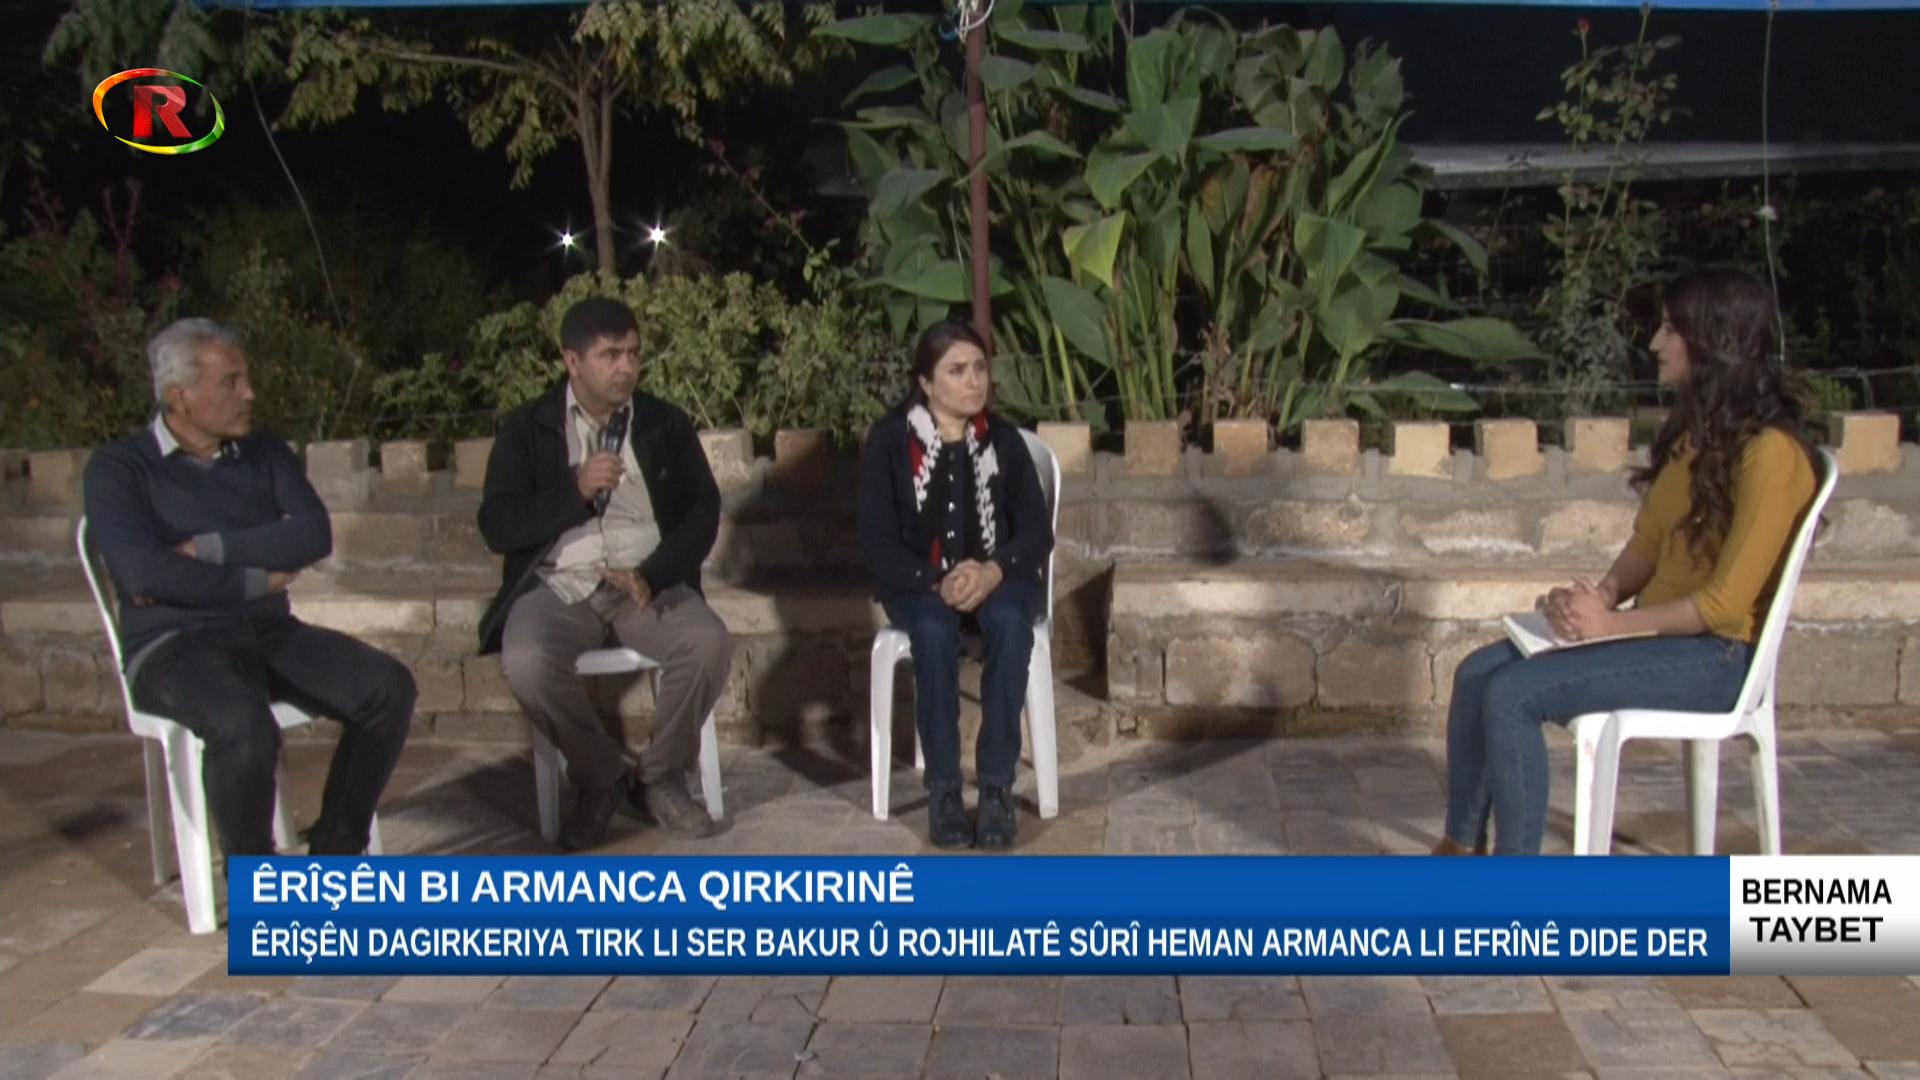 Photo of Ronahi TV -BERNAME TAYBET